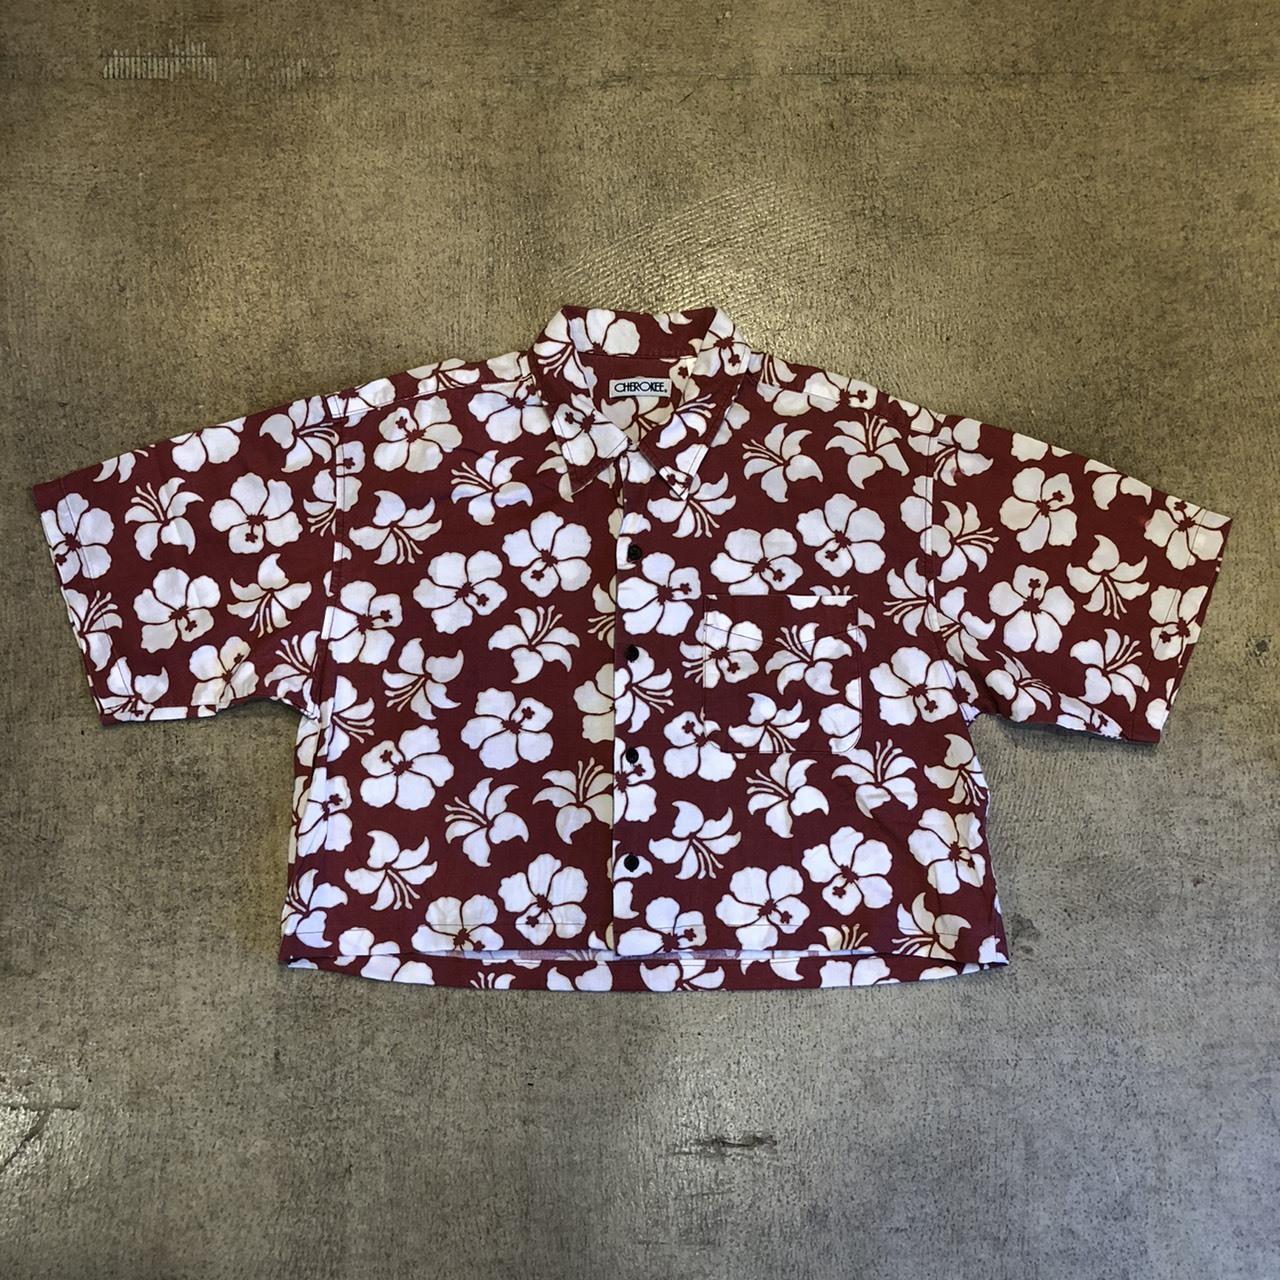 Remake Aloha Shirts No.2 ¥5,900+tax